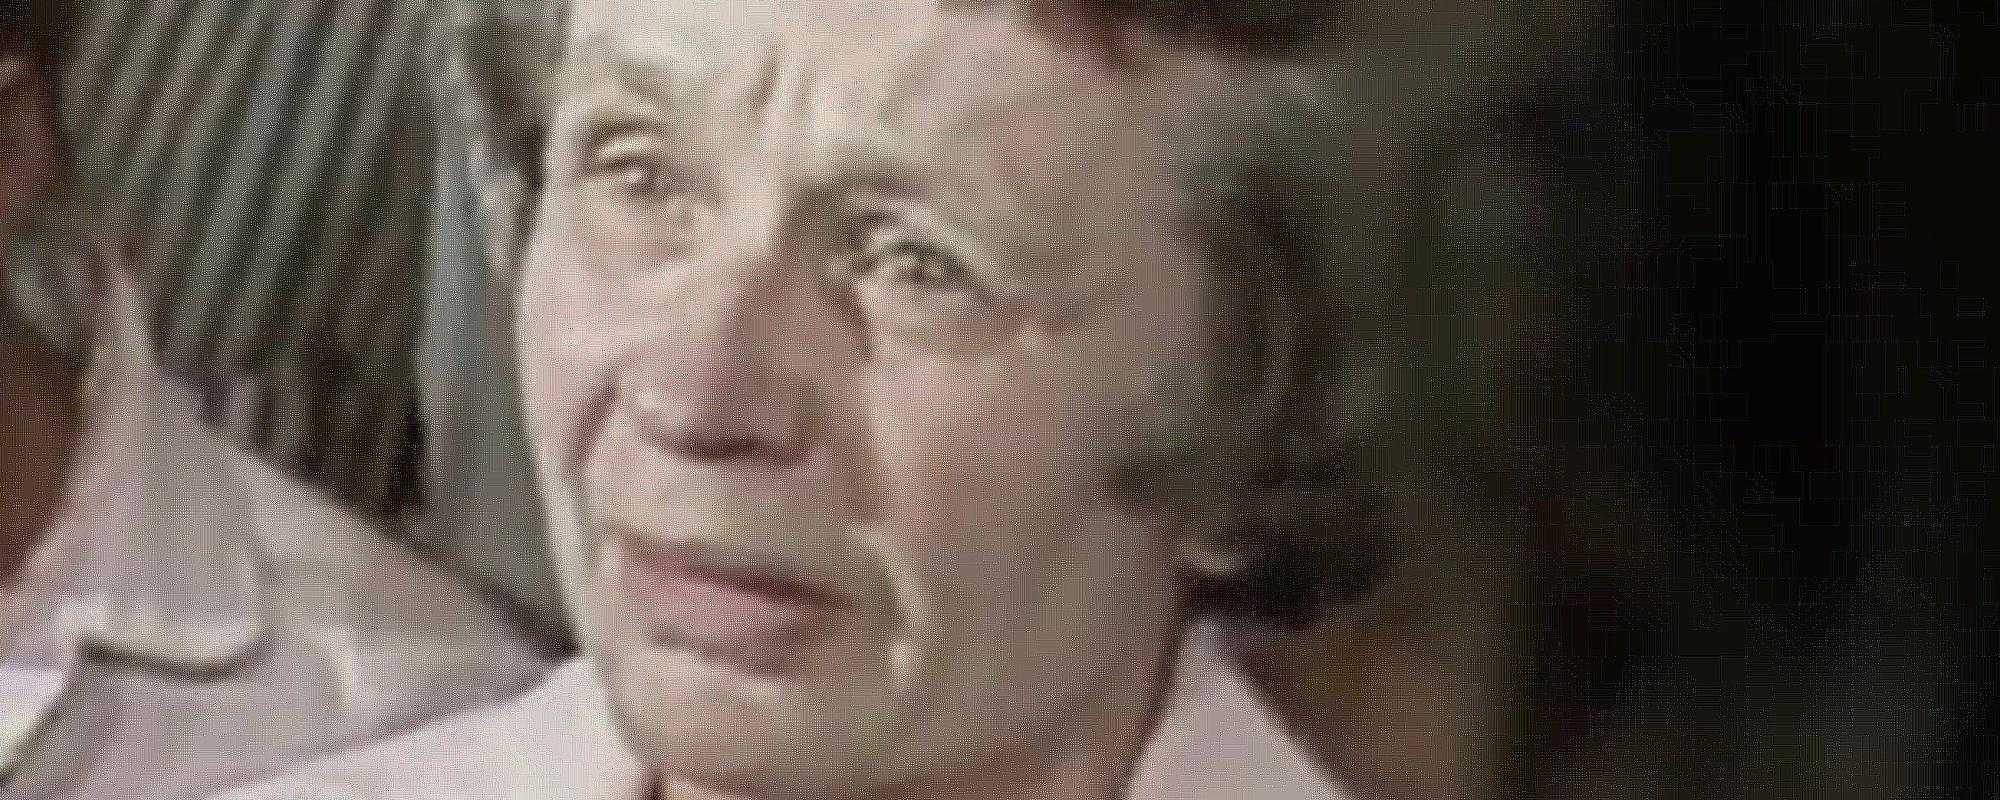 Ted Bundy's Mom Crying